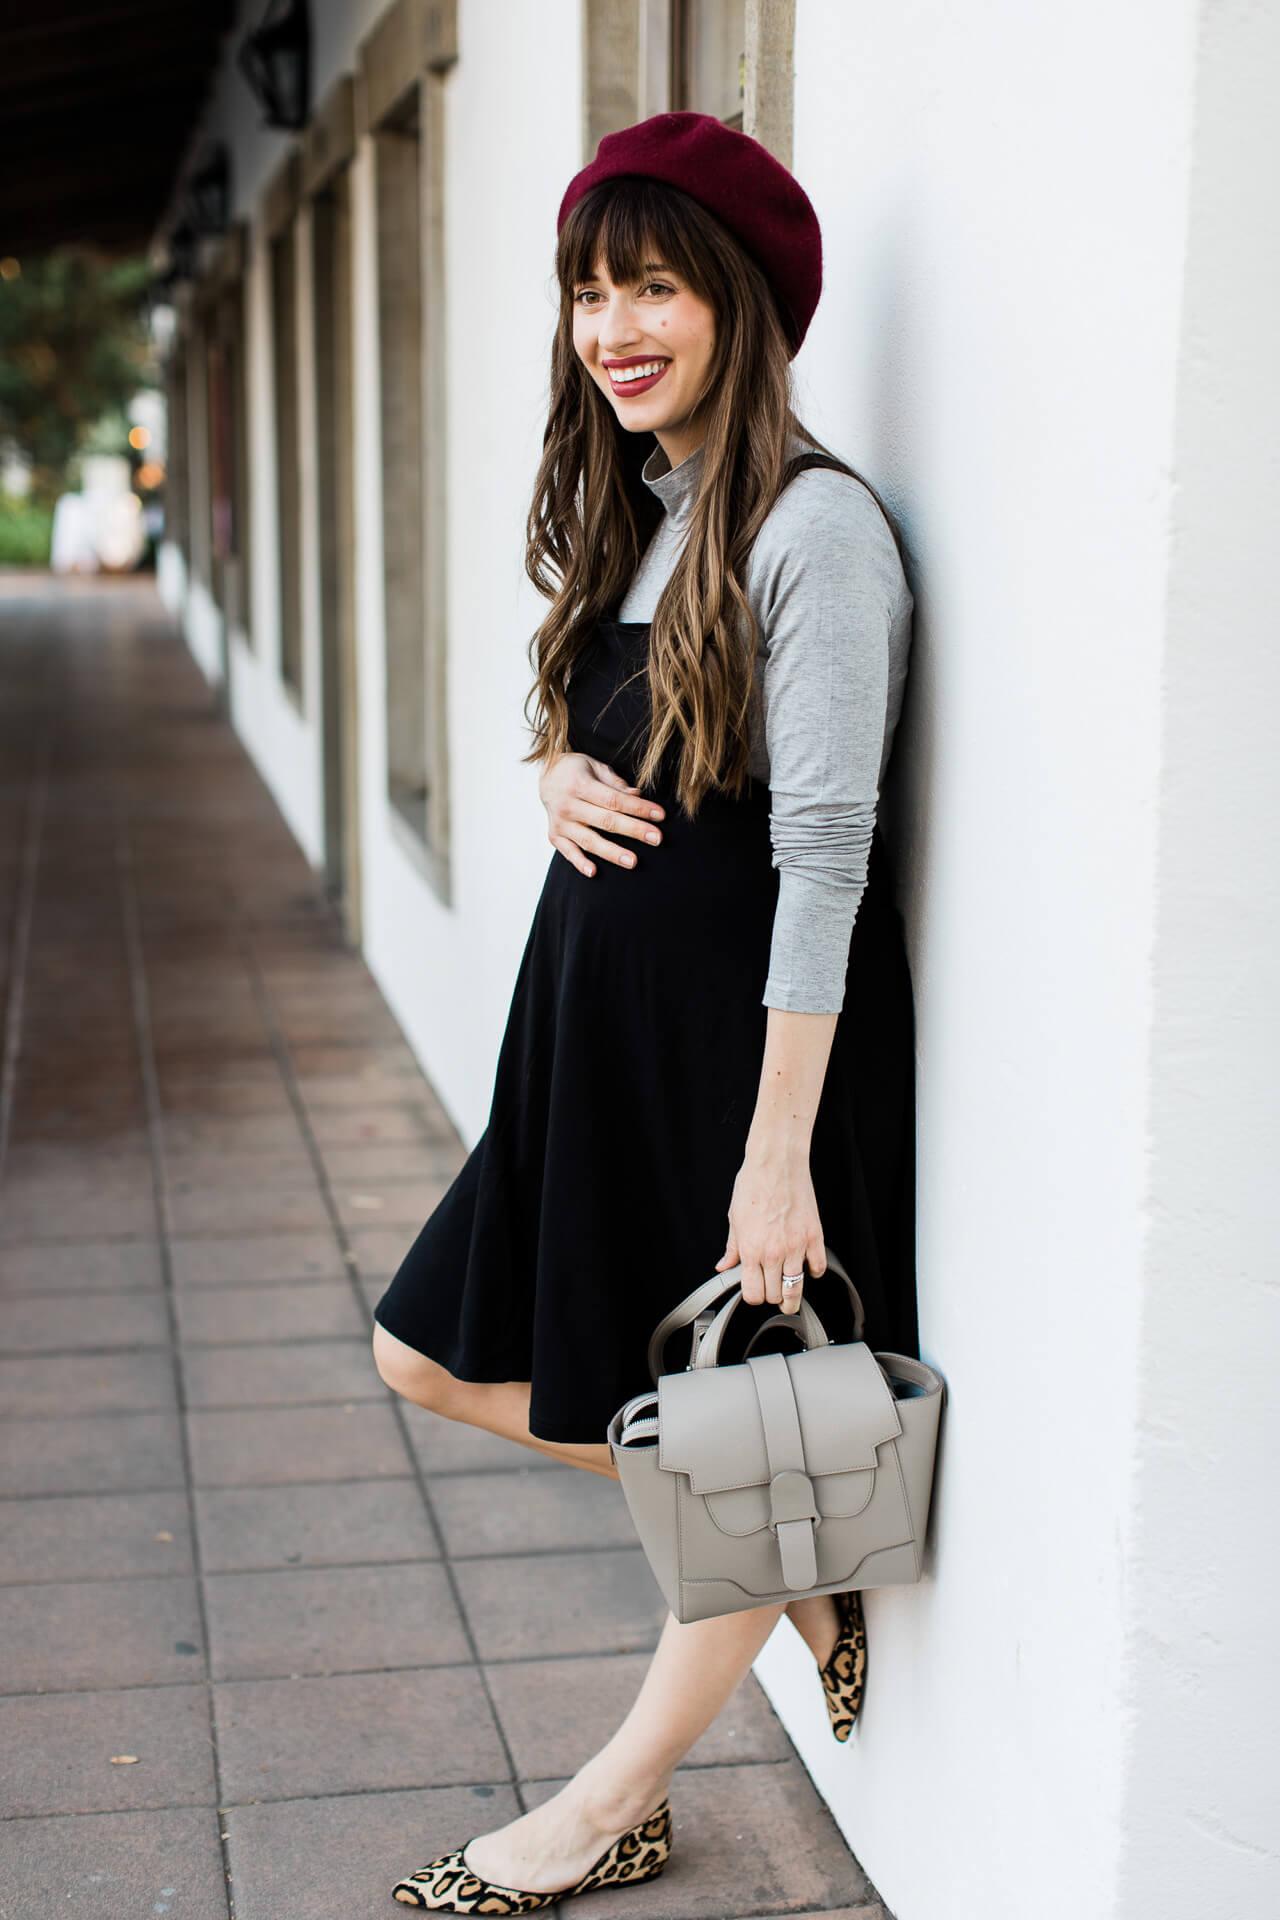 This short black maternity dress is so chic! - M Loves M @marmar